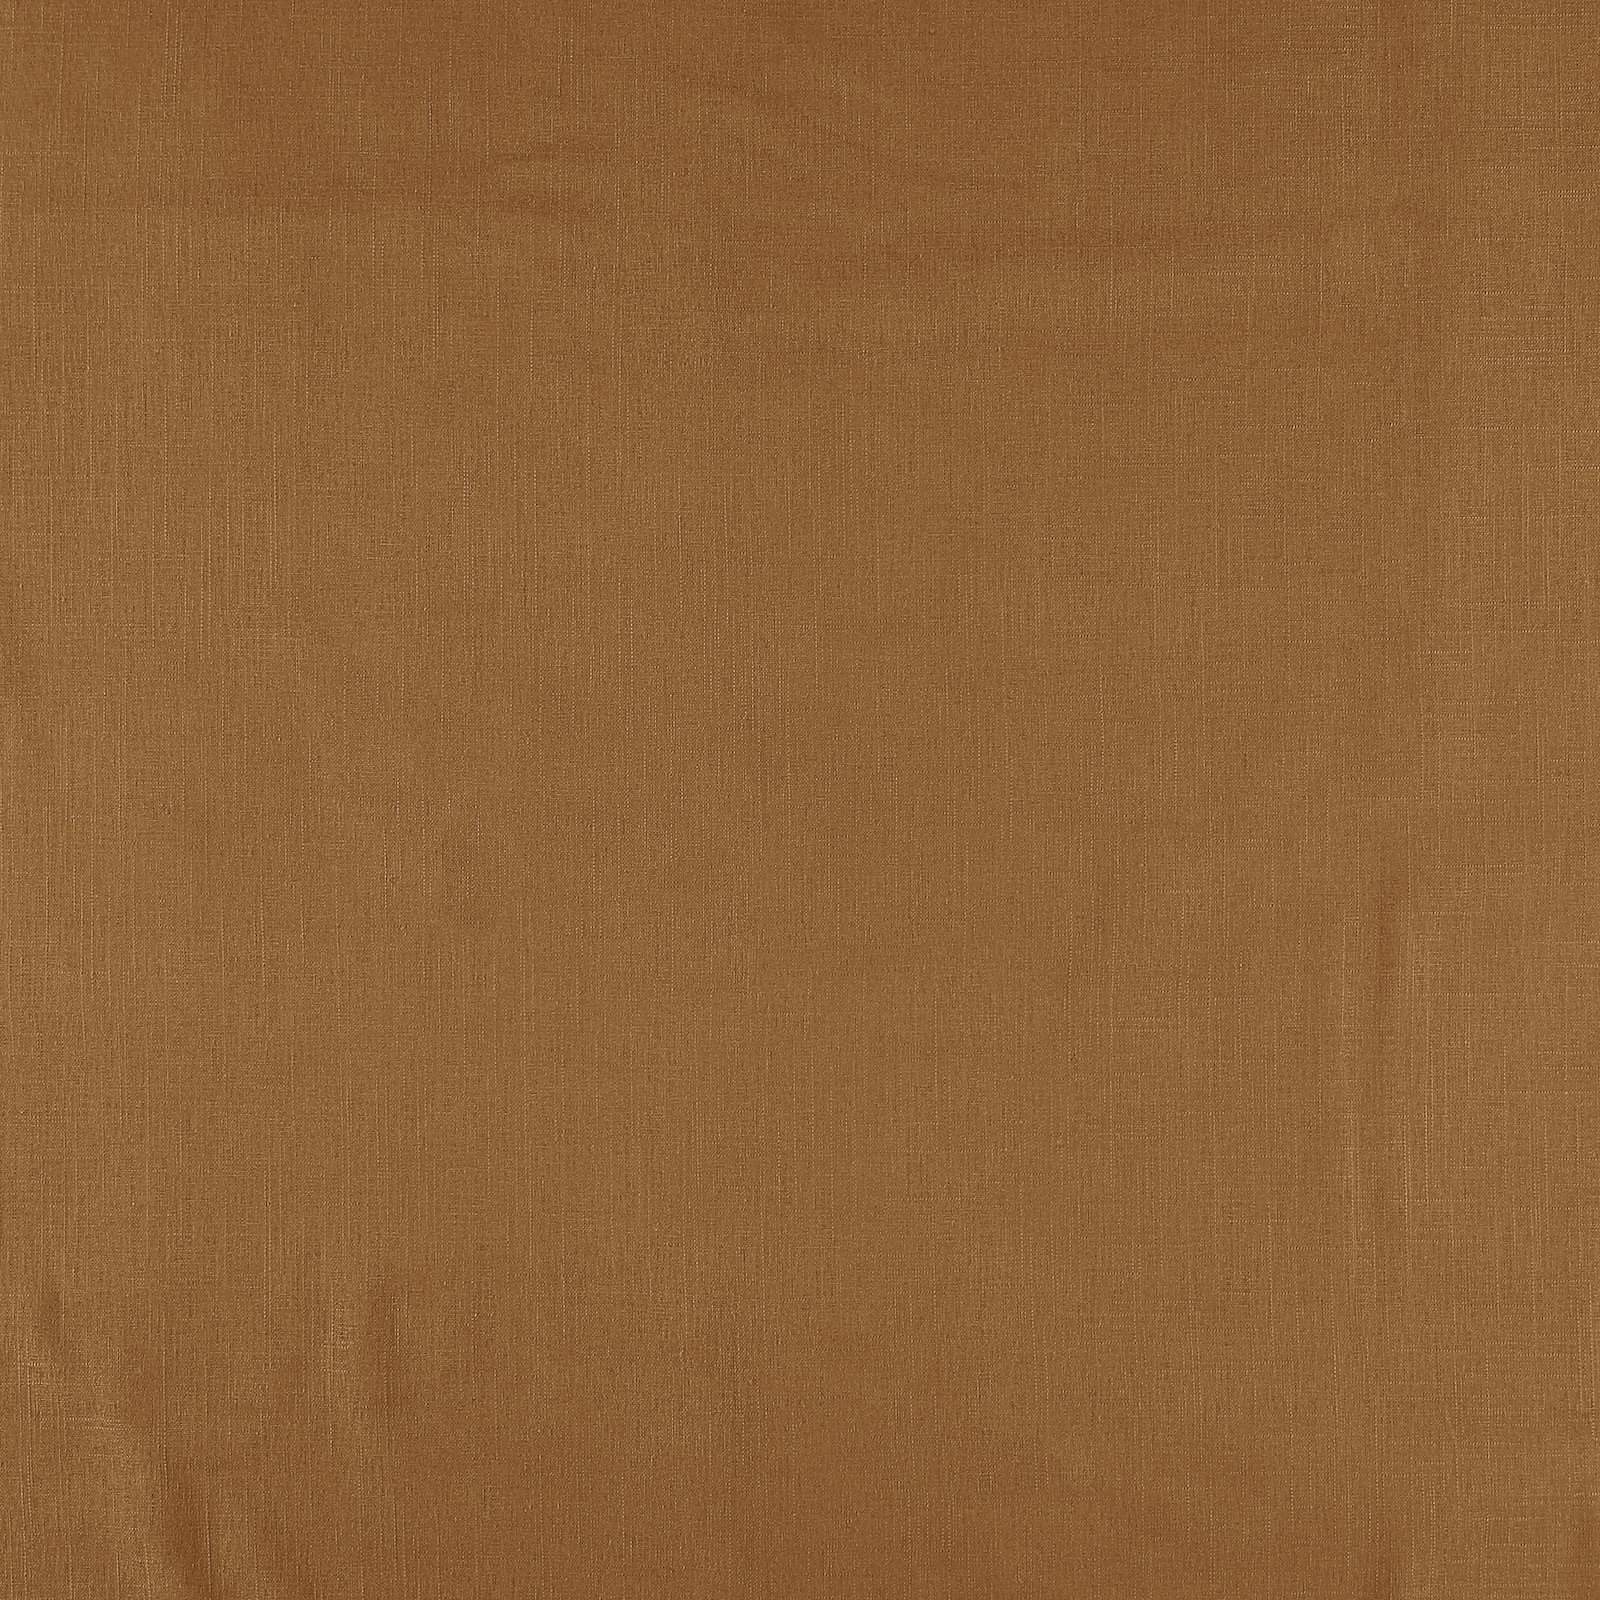 Coarse linen/viscose light caramel 852332_pack_solid